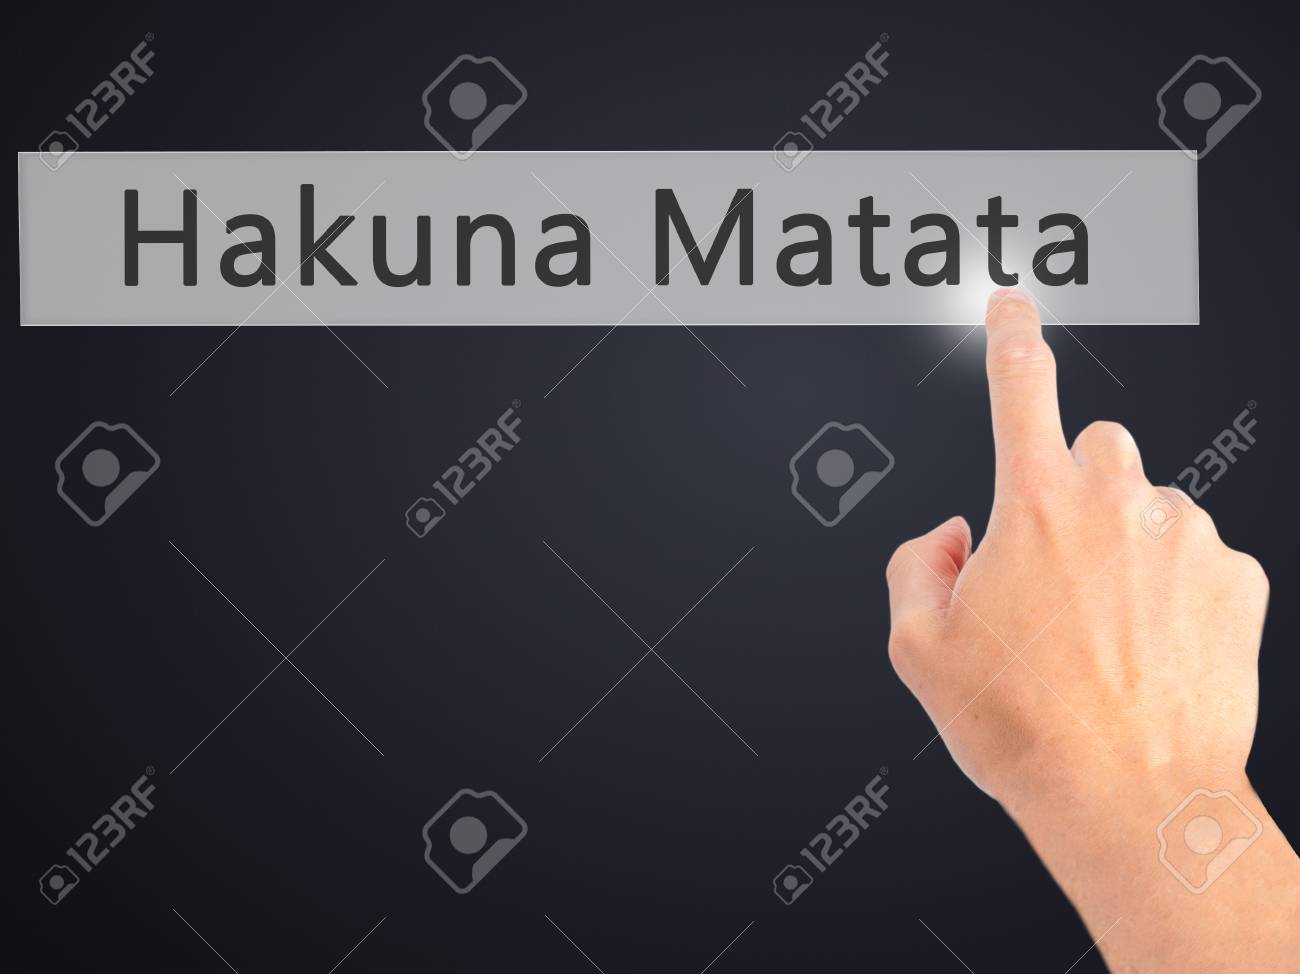 Hakuna Matata Frase Swahili Que Significa Sin Preocupaciones